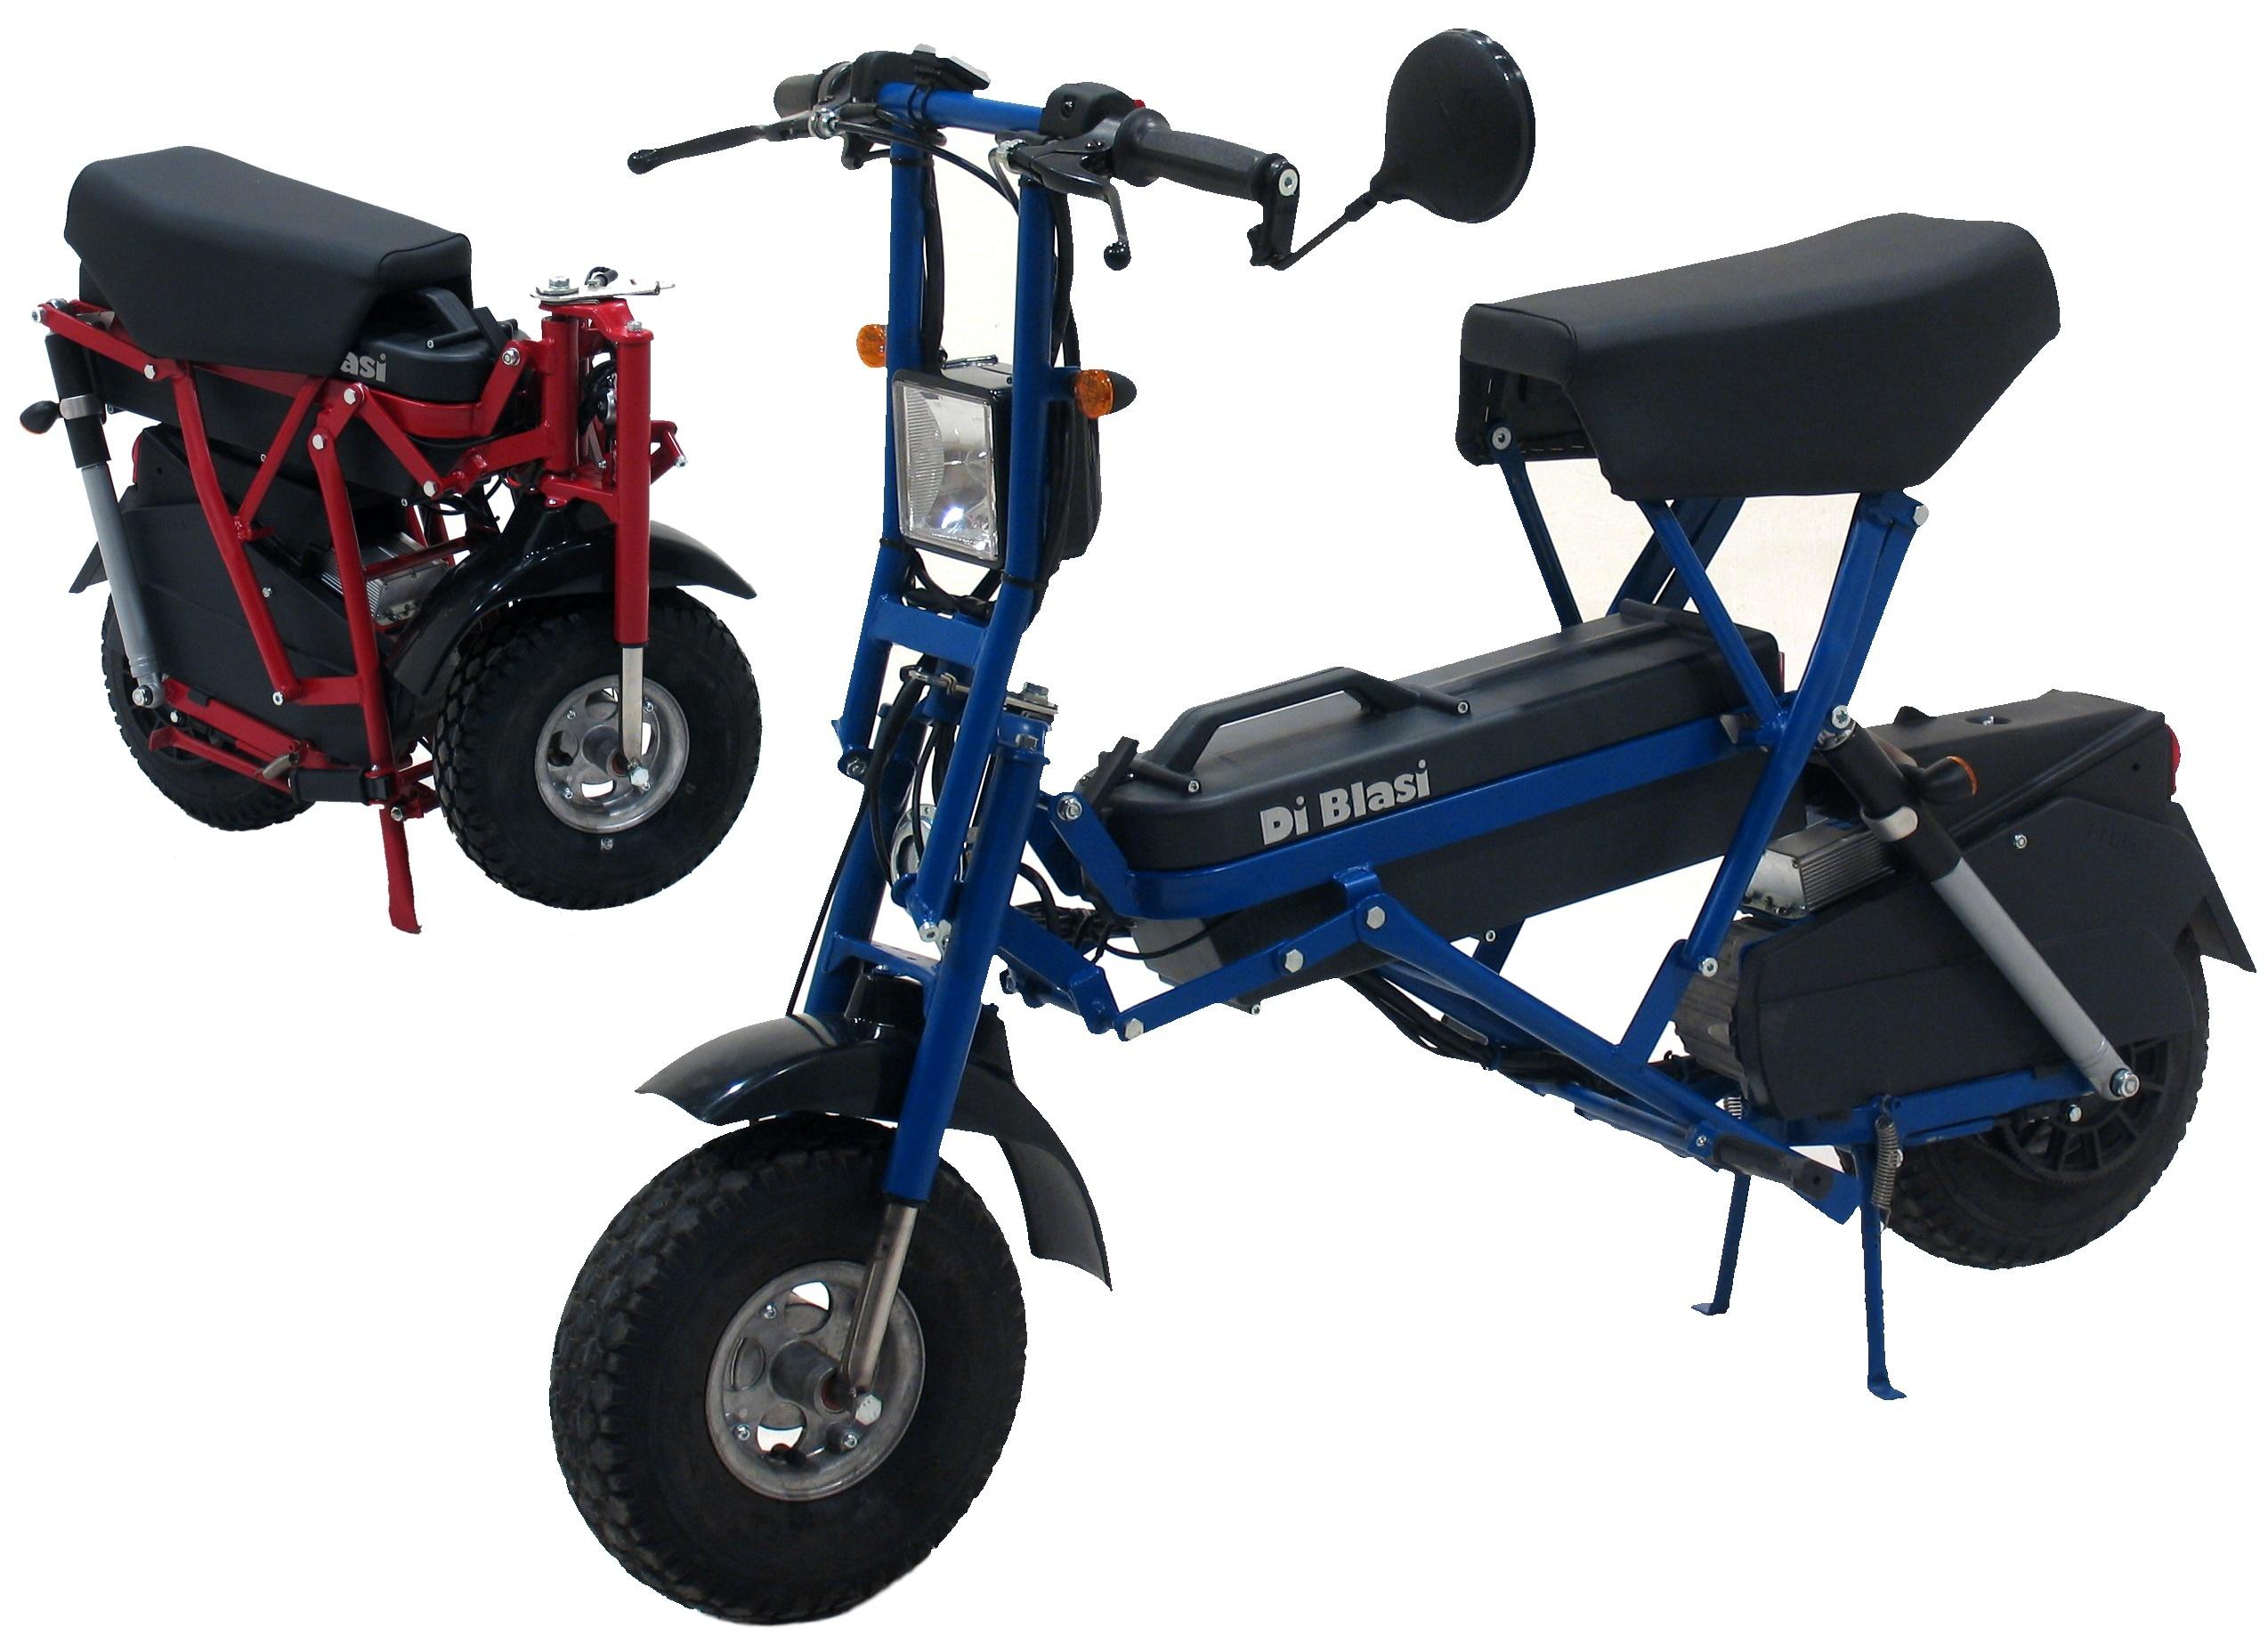 50 cc mopeds 15